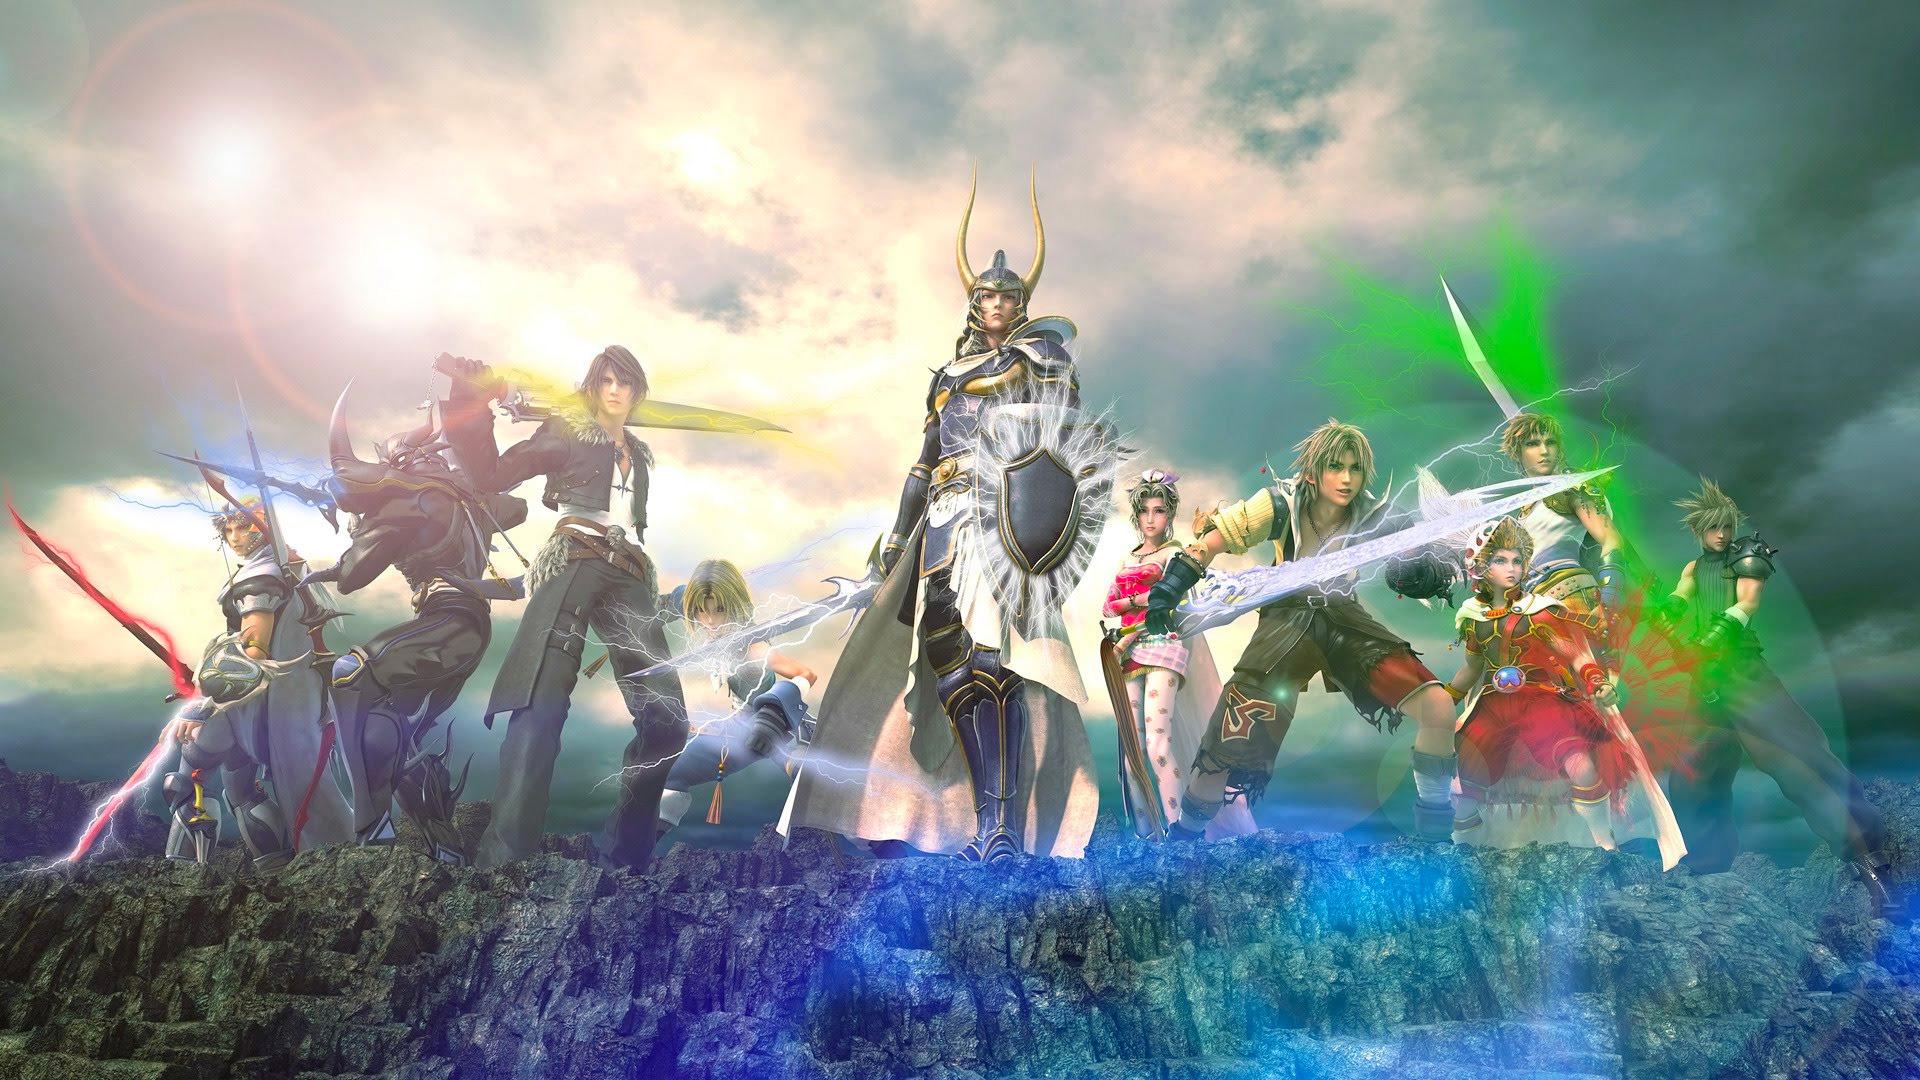 DISSIDIA Final Fantasy NT Wallpapers In Ultra HD 4K Gameranx